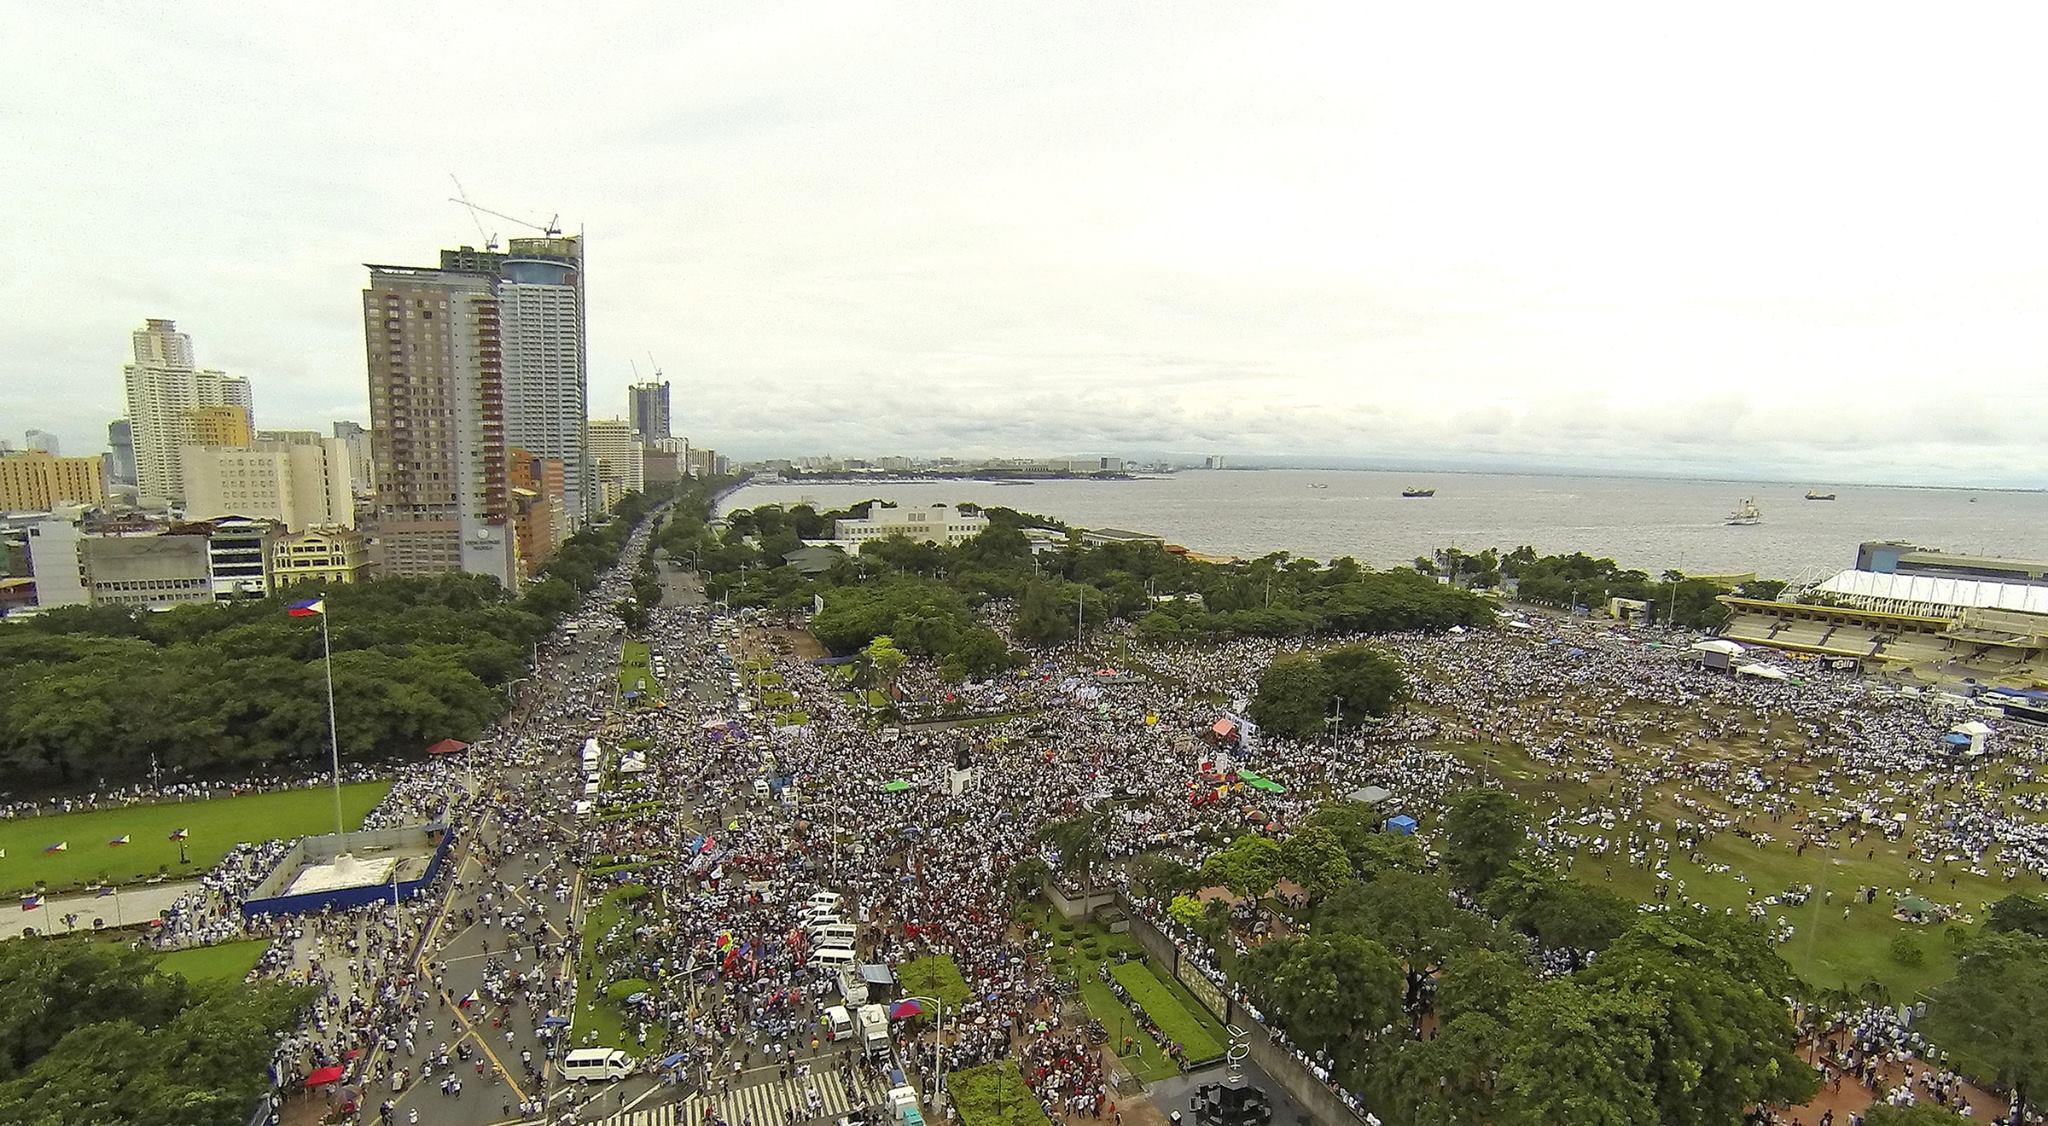 Drone Produces Memorable Aerial Photos Of Anti Pork Rally